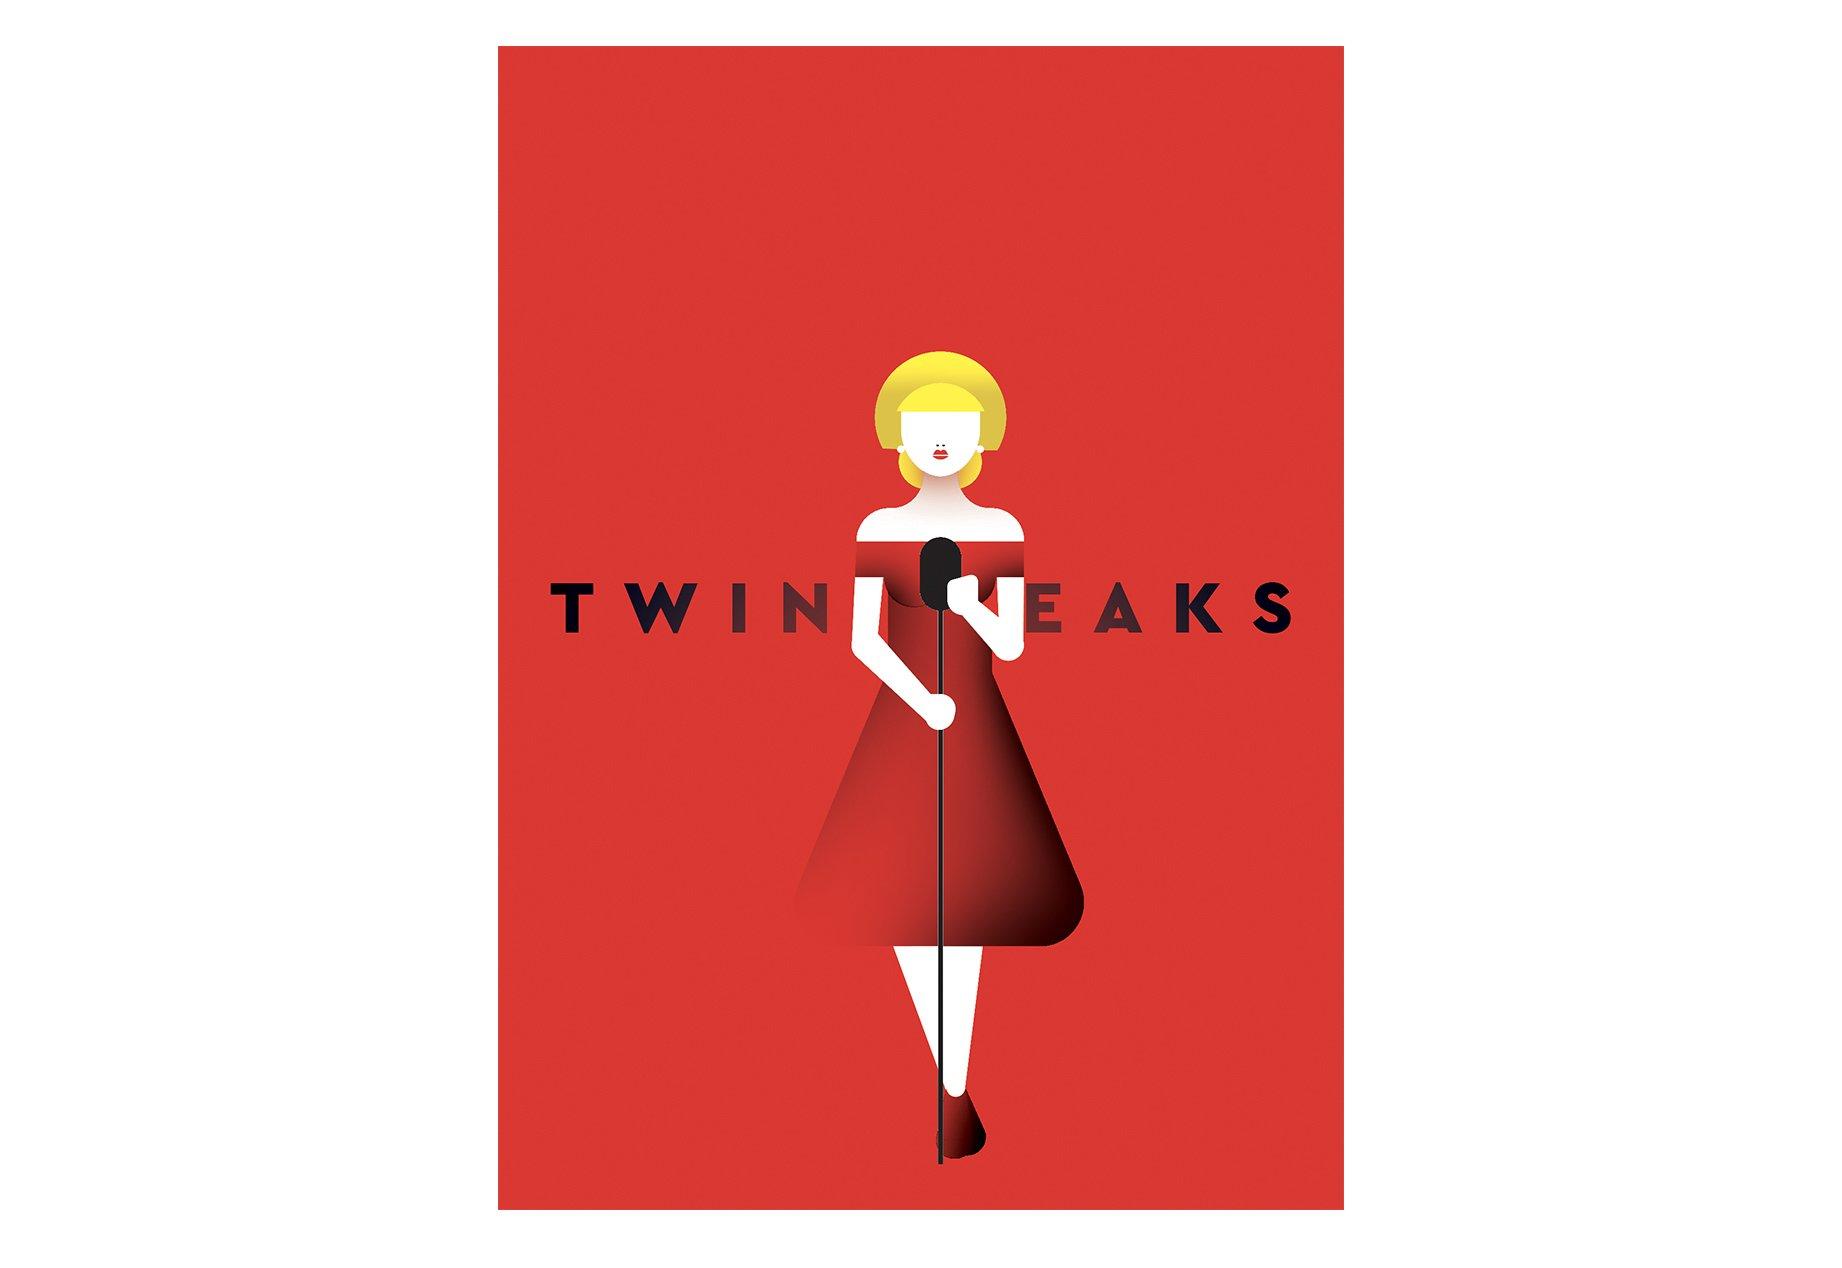 twin-peaks-poster-illustration-alice-iuri